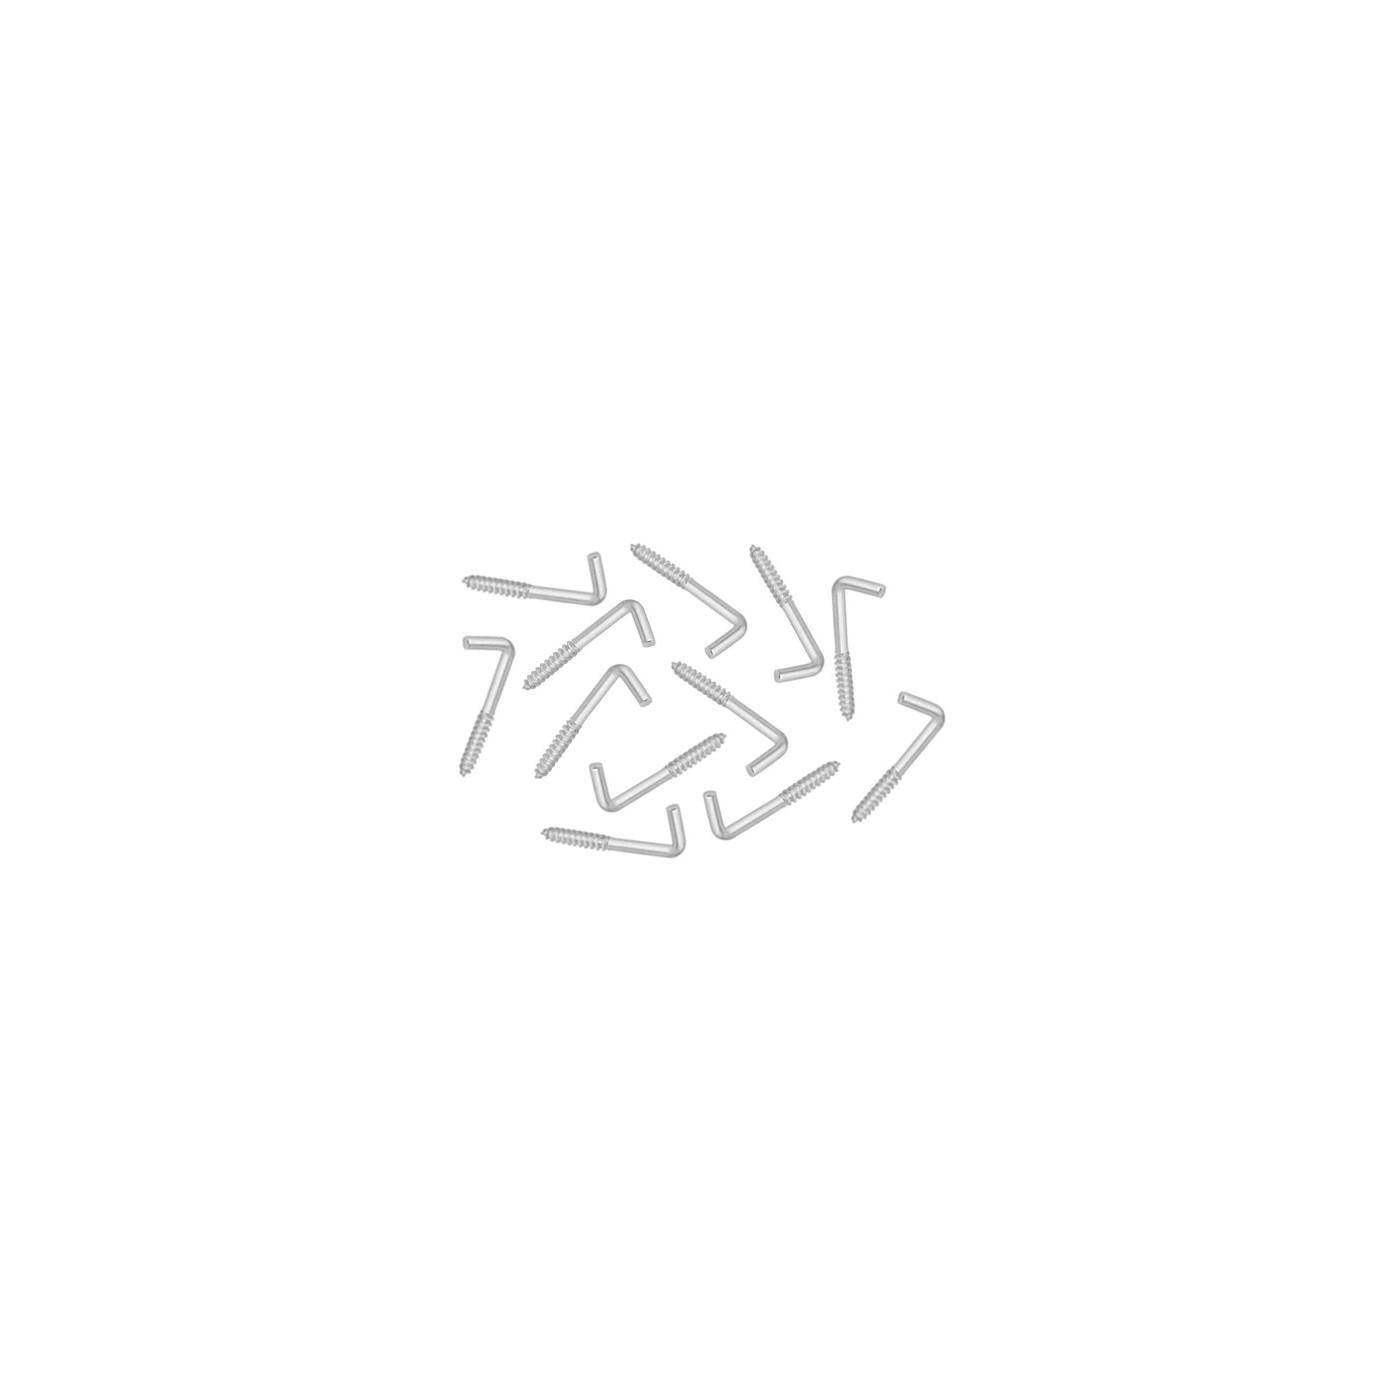 Set of 96 metal screw hooks (3 cm length)